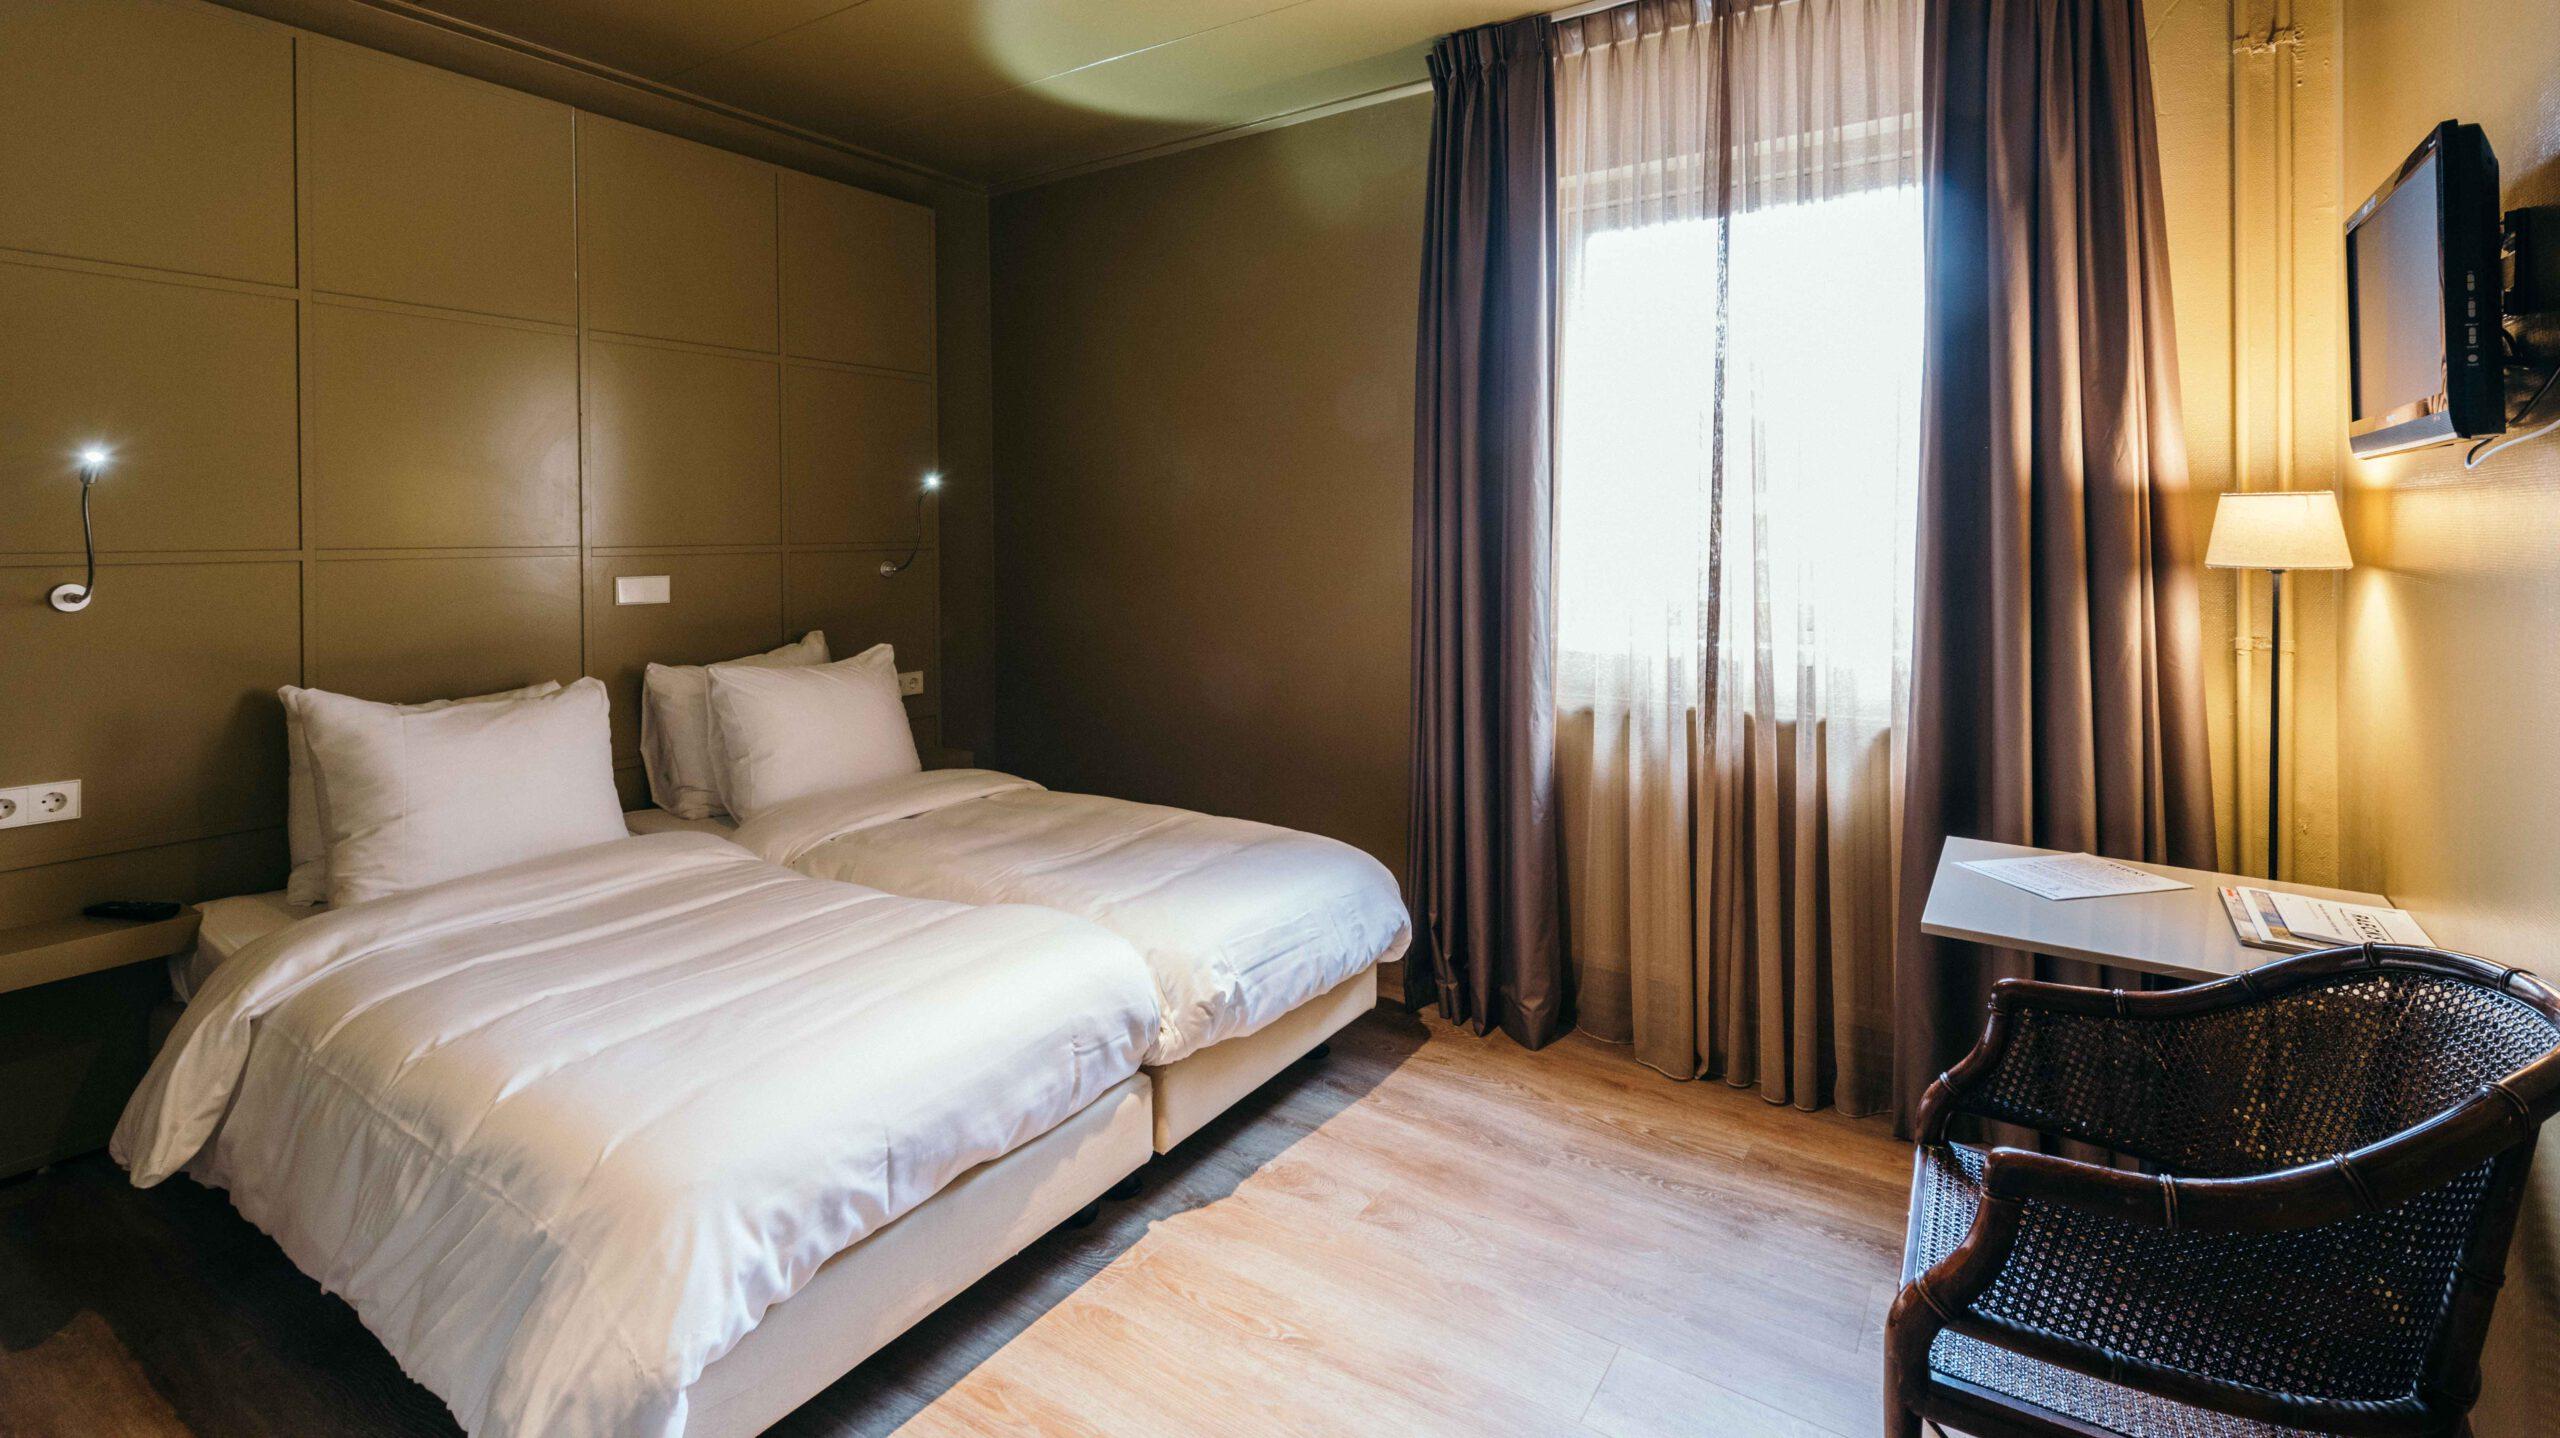 Hotel Kamer Haarlem